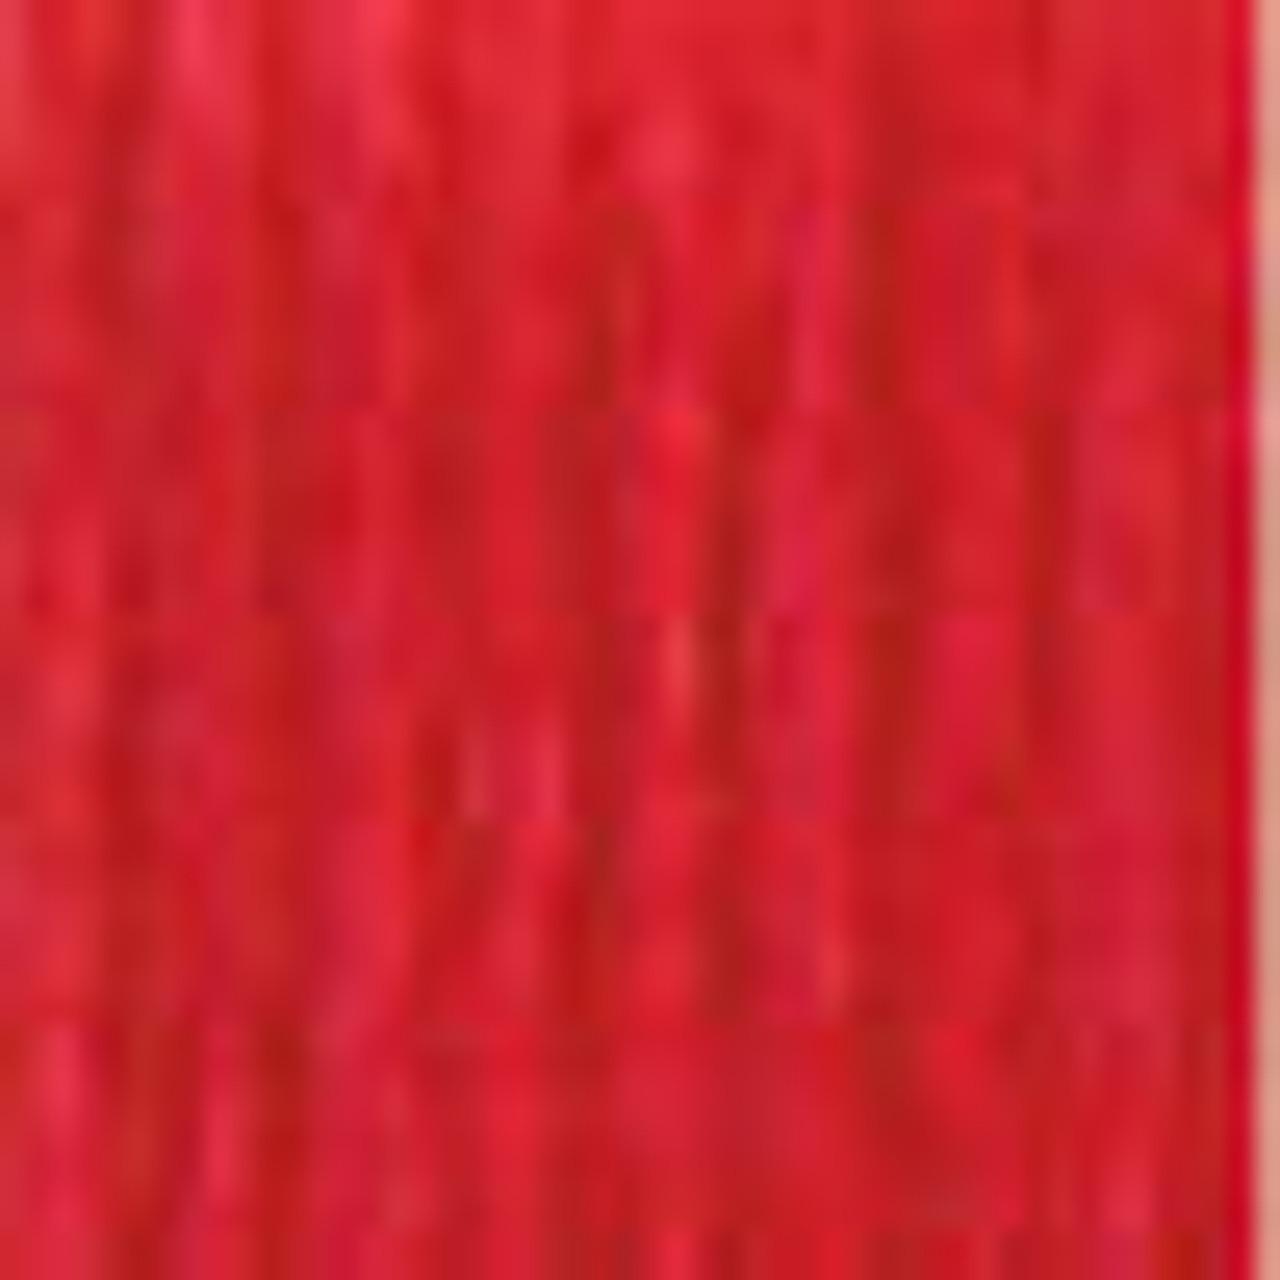 DMC # 150 Ultra Very Dk Dusty Rose Floss / Thread